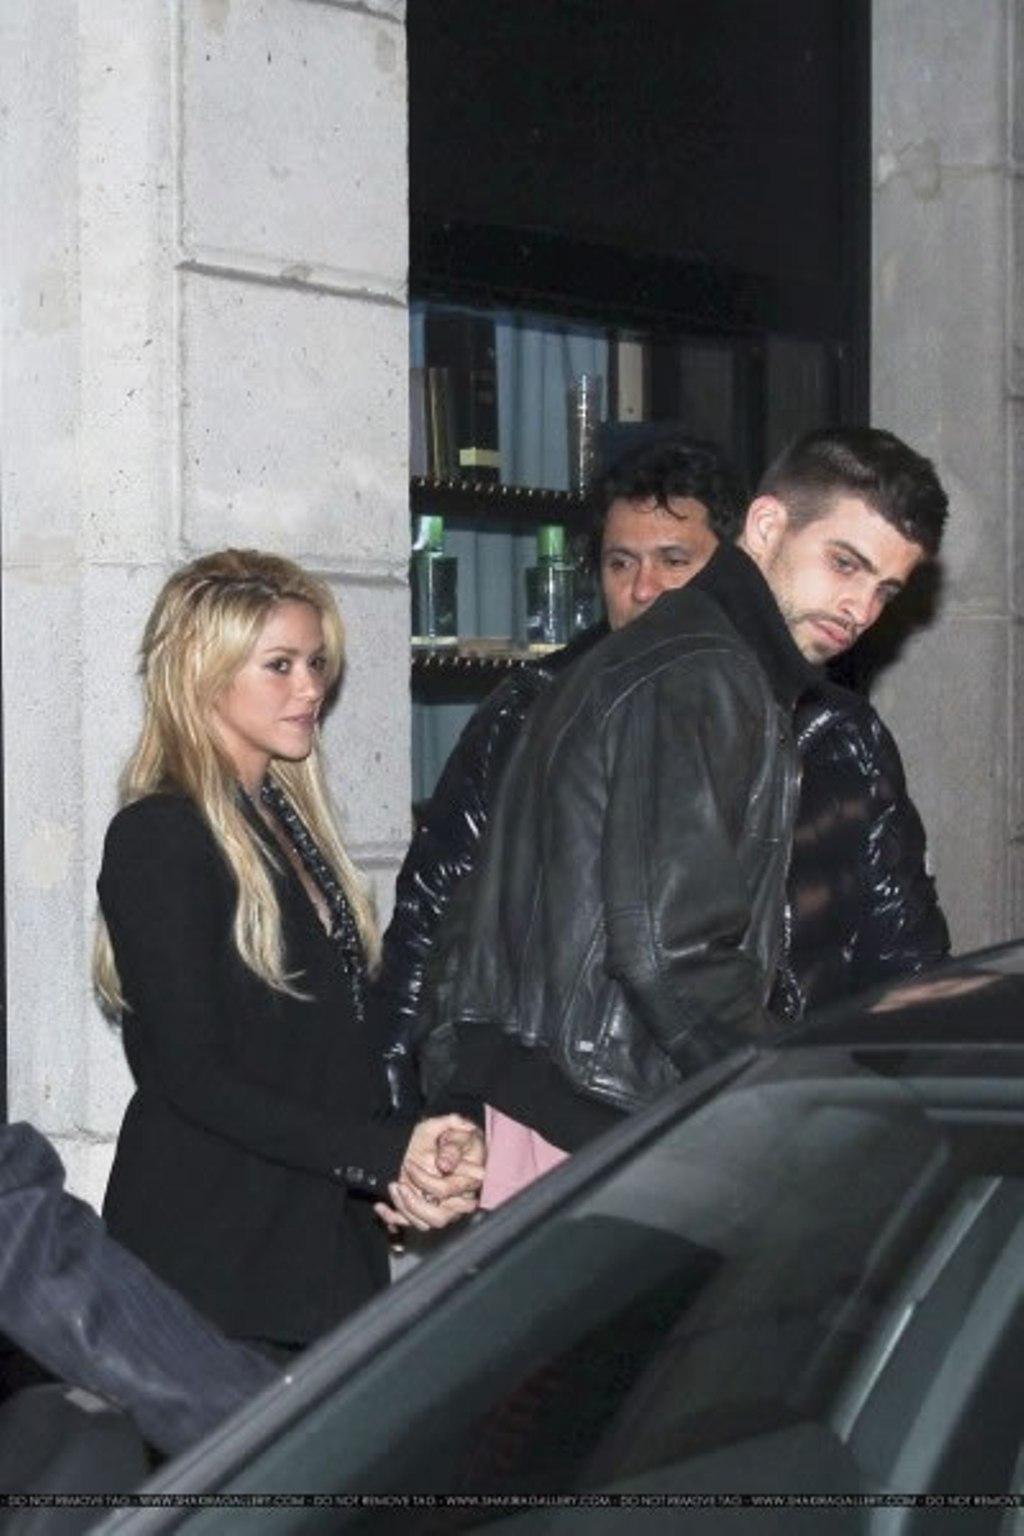 Shakira and Pique. - Page 2 Gerard-Piqu-Shakira-and-brother-gerard-pique-19520953-1024-1536